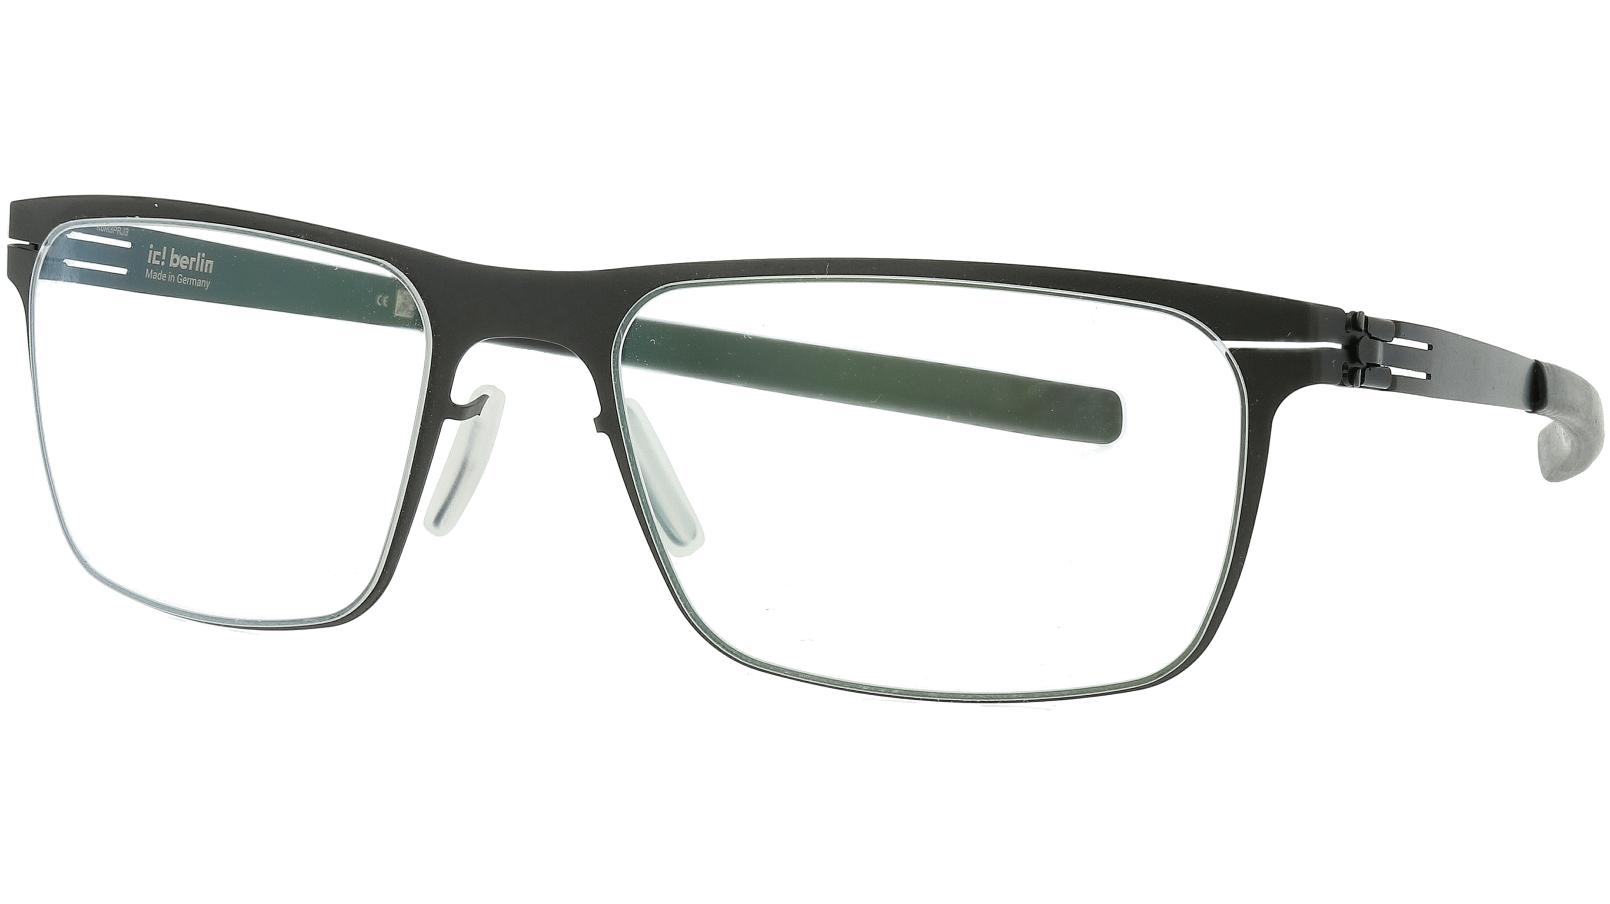 IC BERLIN! 135 Seekorso Black Glasses